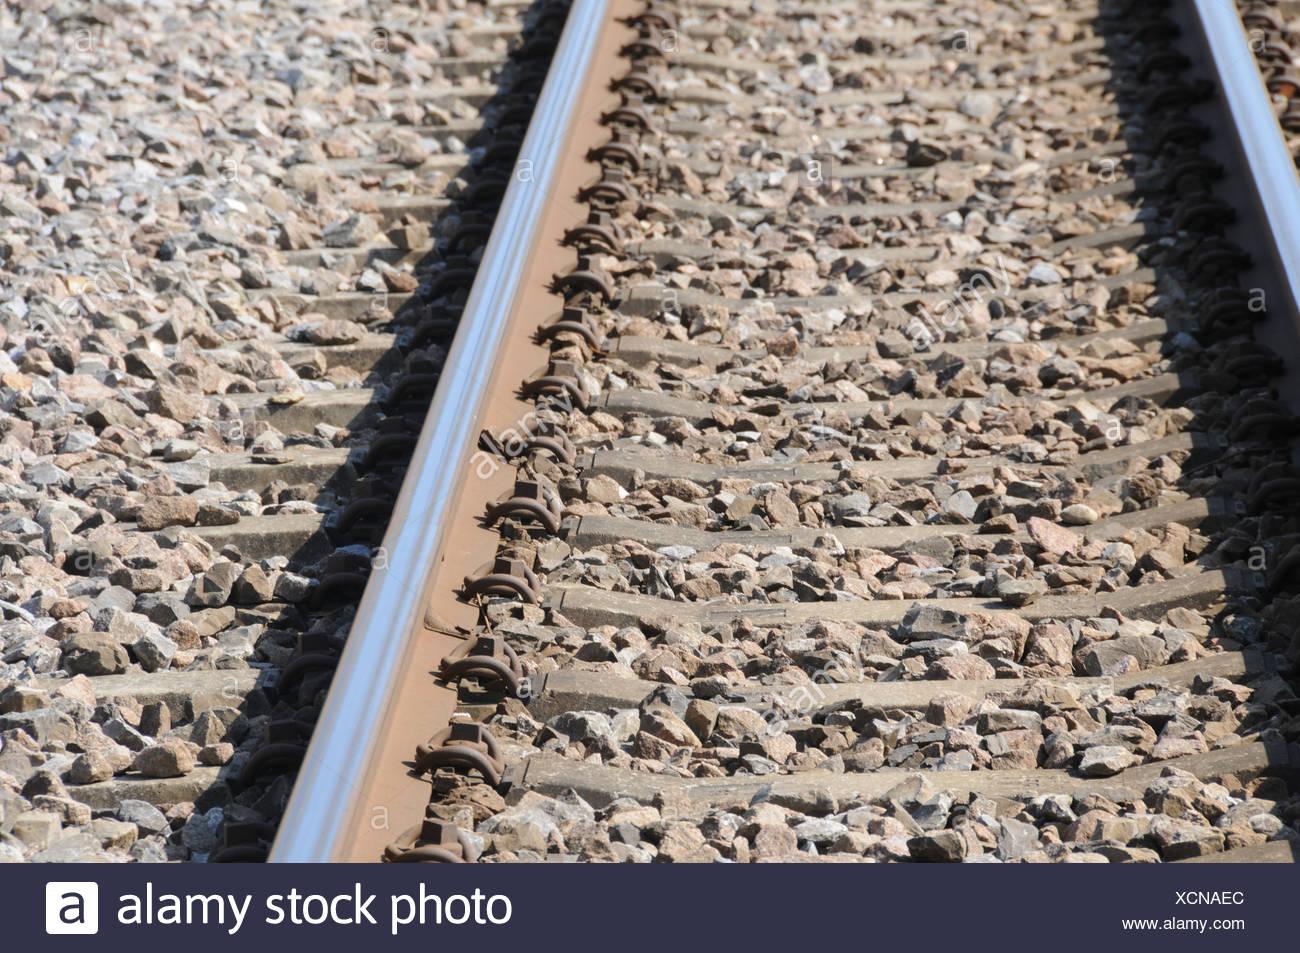 Railroad, rails, iron, rails, railroad, grits, road metals, direction, just, concepts, - Stock Image